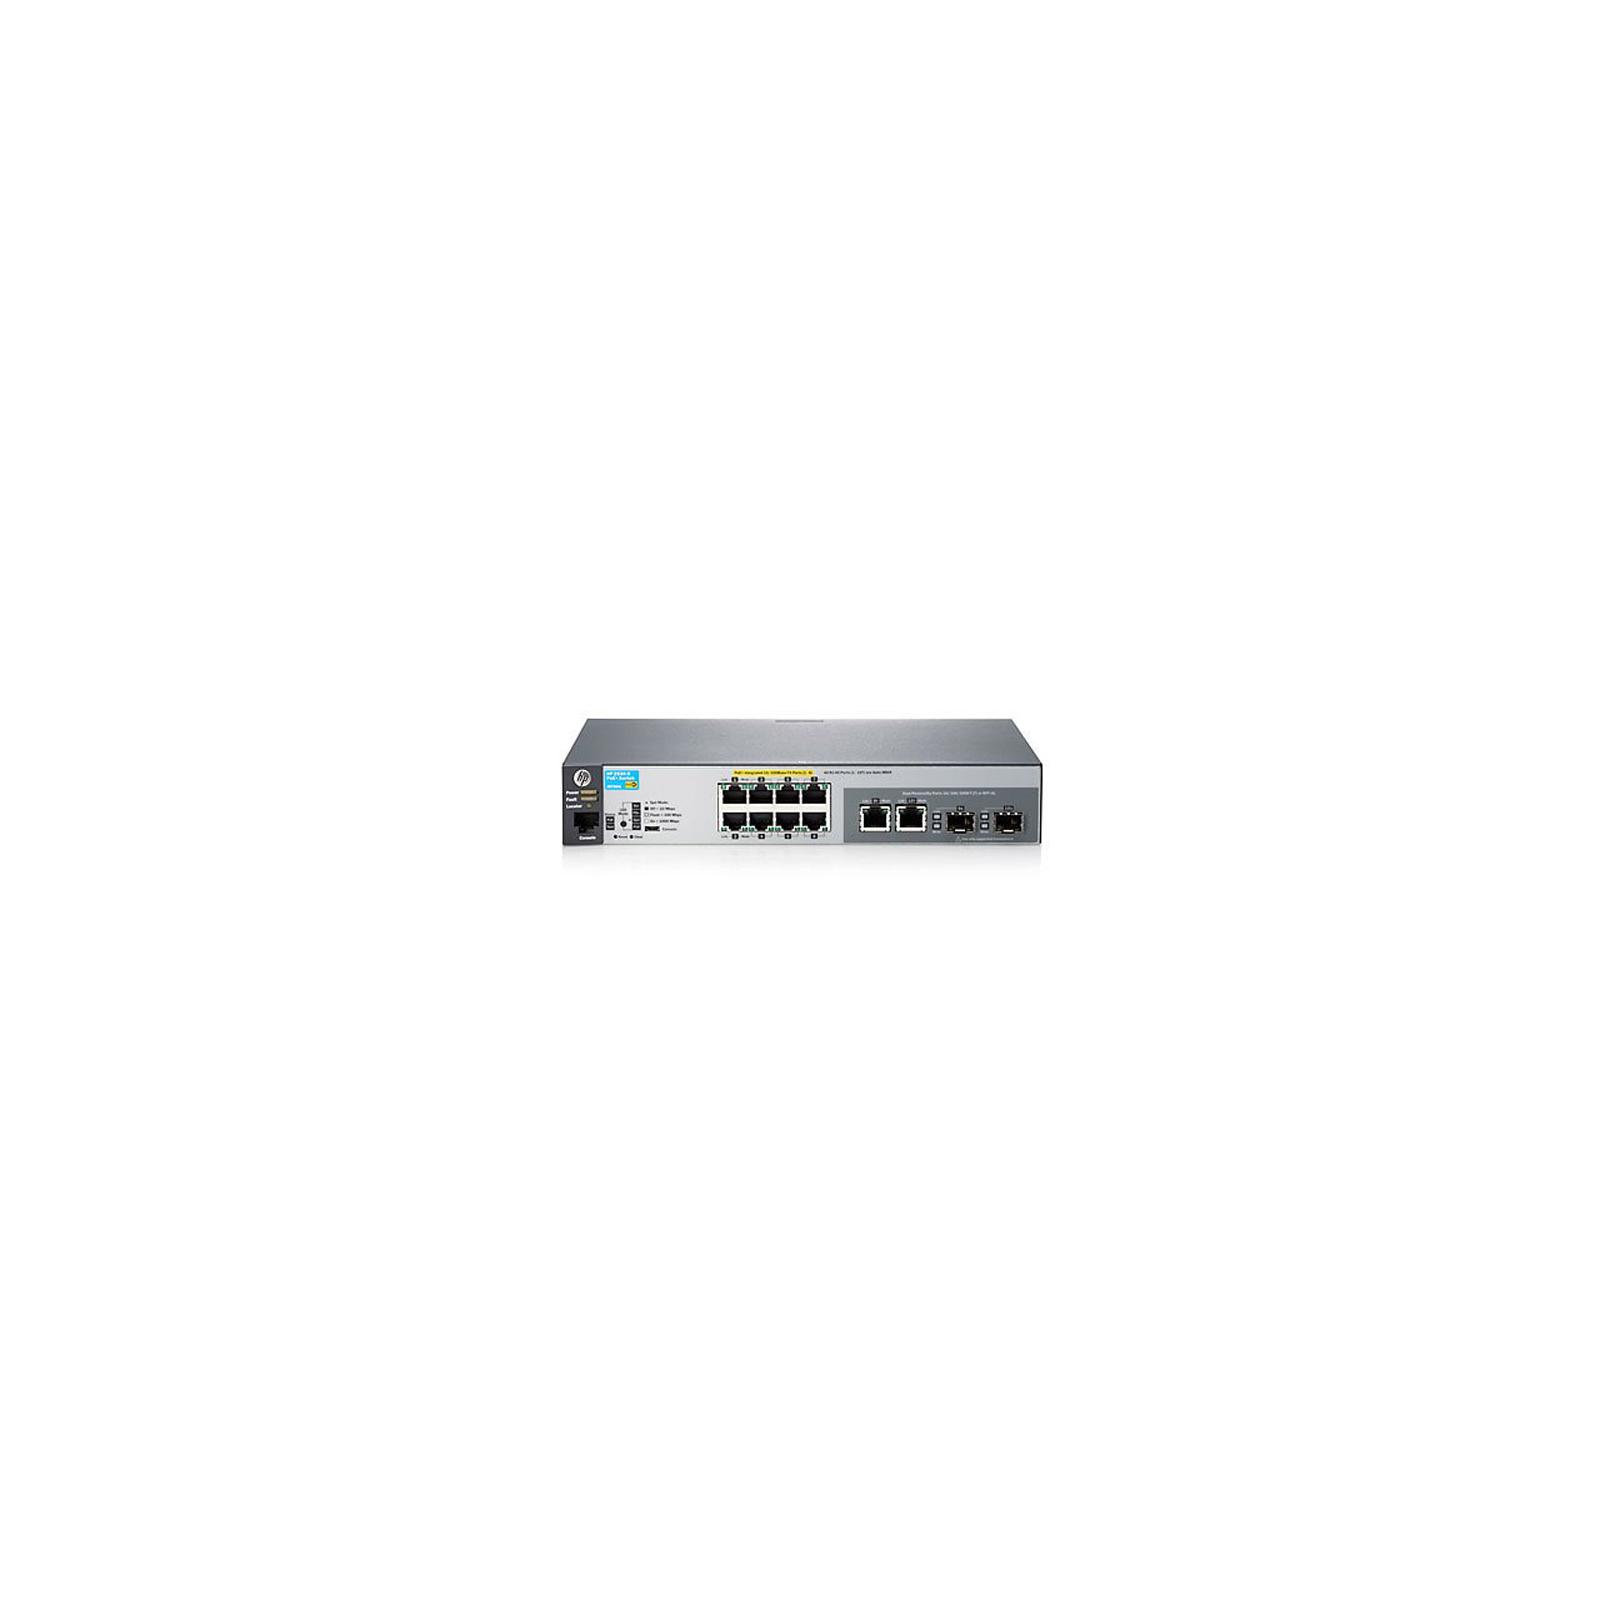 Коммутатор сетевой HP 2530-8-PoE+ (J9780A)